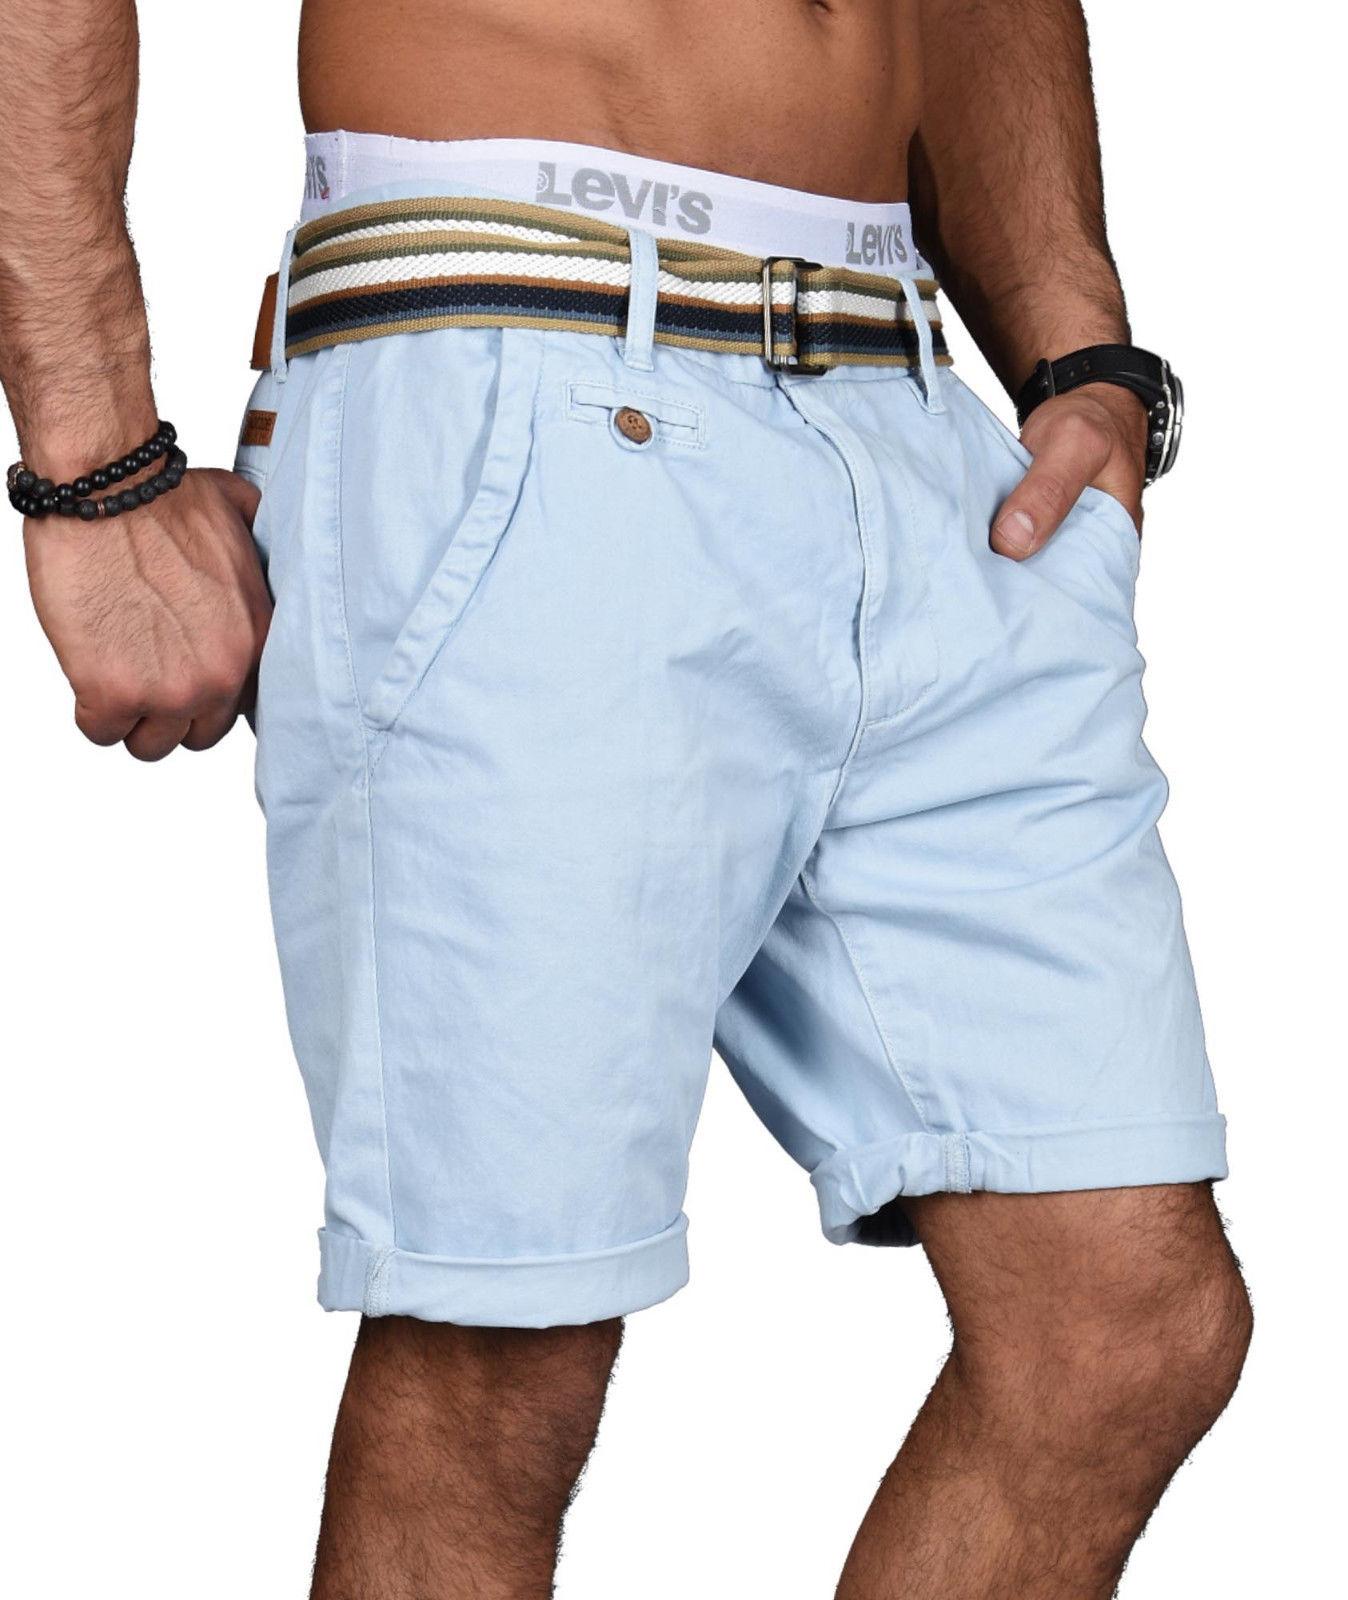 Indicode-Herren-Sommer-Bermuda-Chino-Shorts-kurze-Hose-Sommerhose-Short-NEU-B499 Indexbild 11